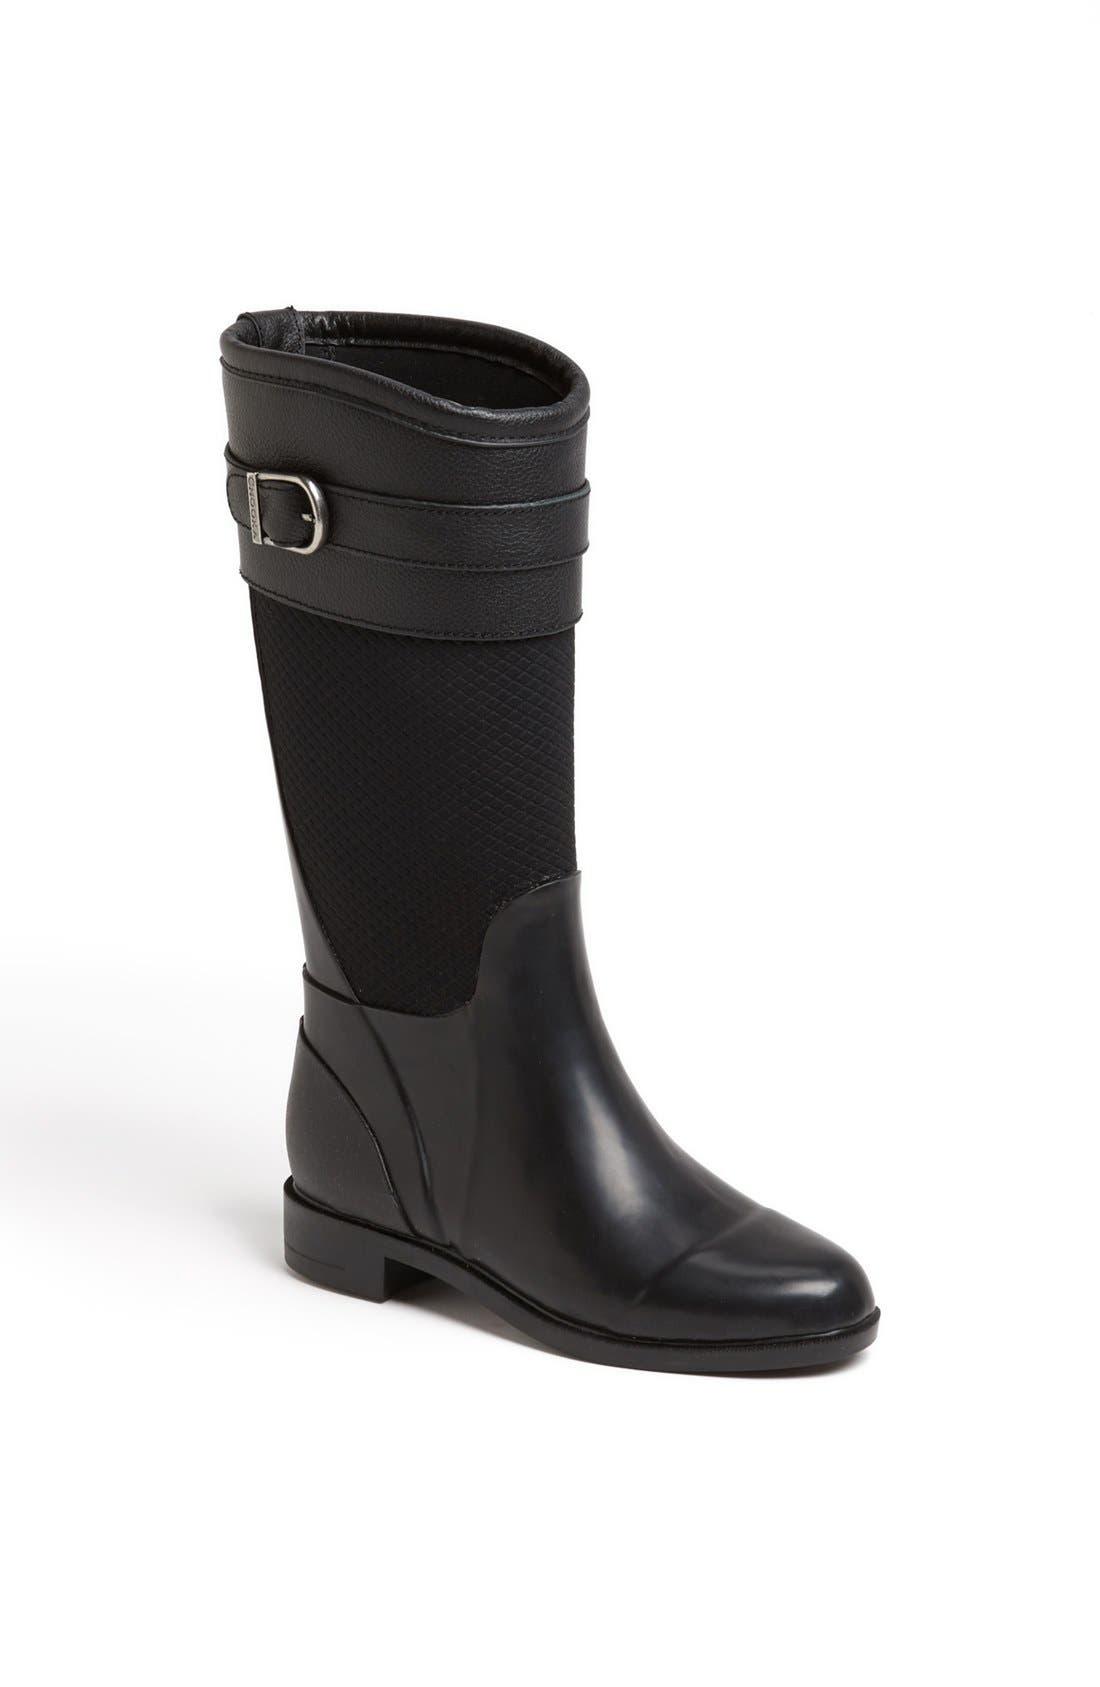 Main Image - Chooka 'Bolero' Waterproof Rain Boot (Women)